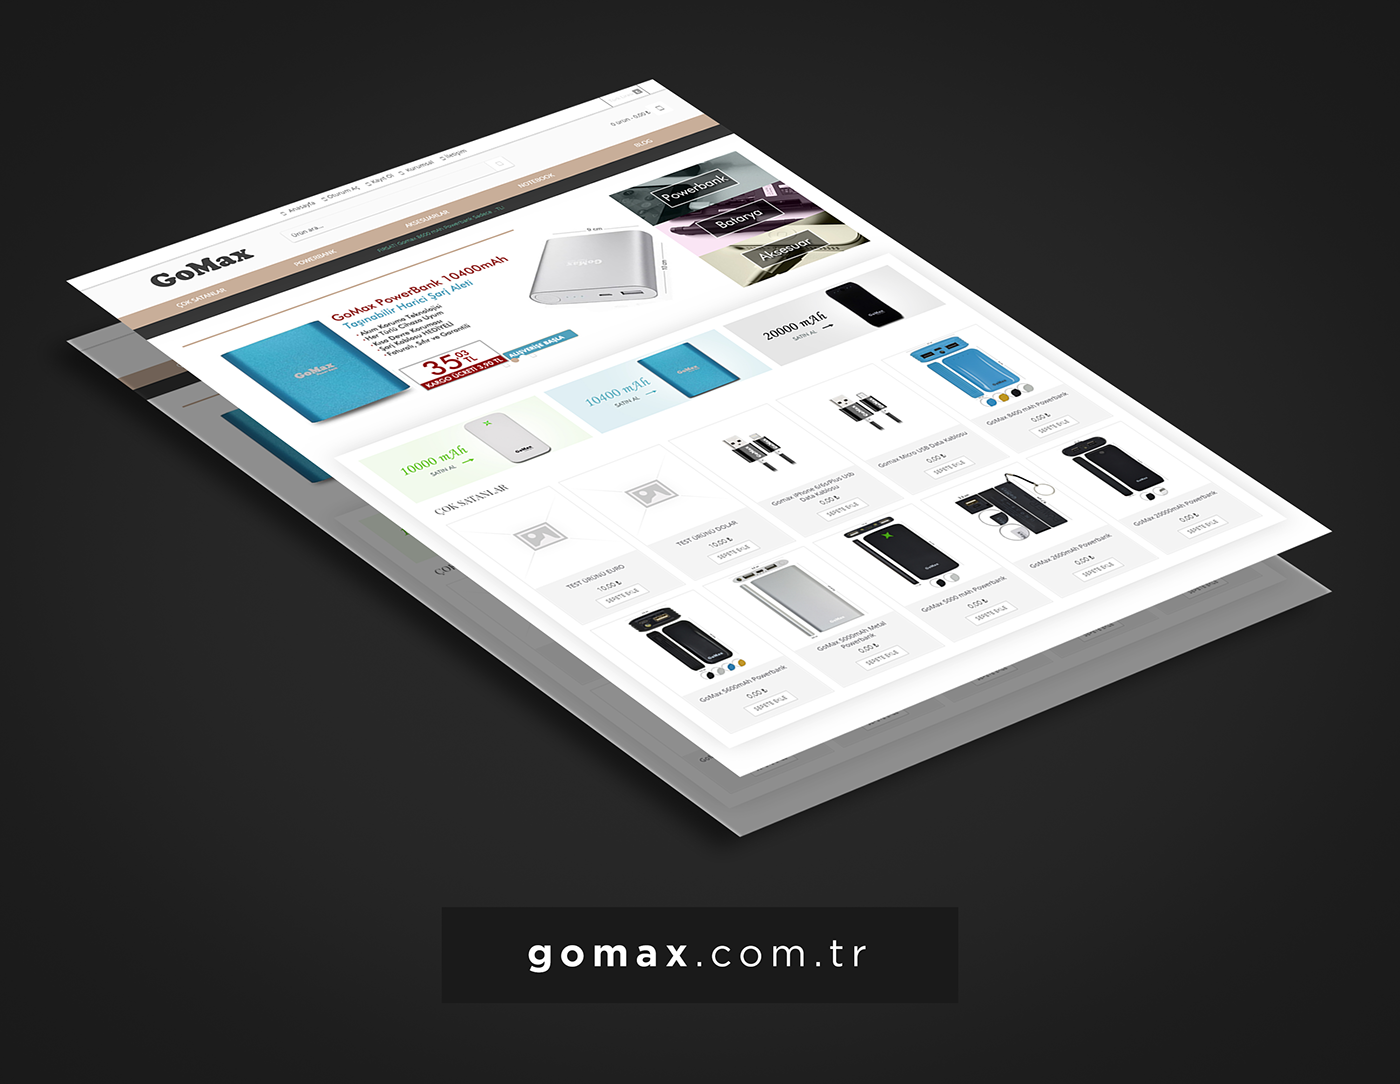 Gomax.com.tr - Sefa Gedik